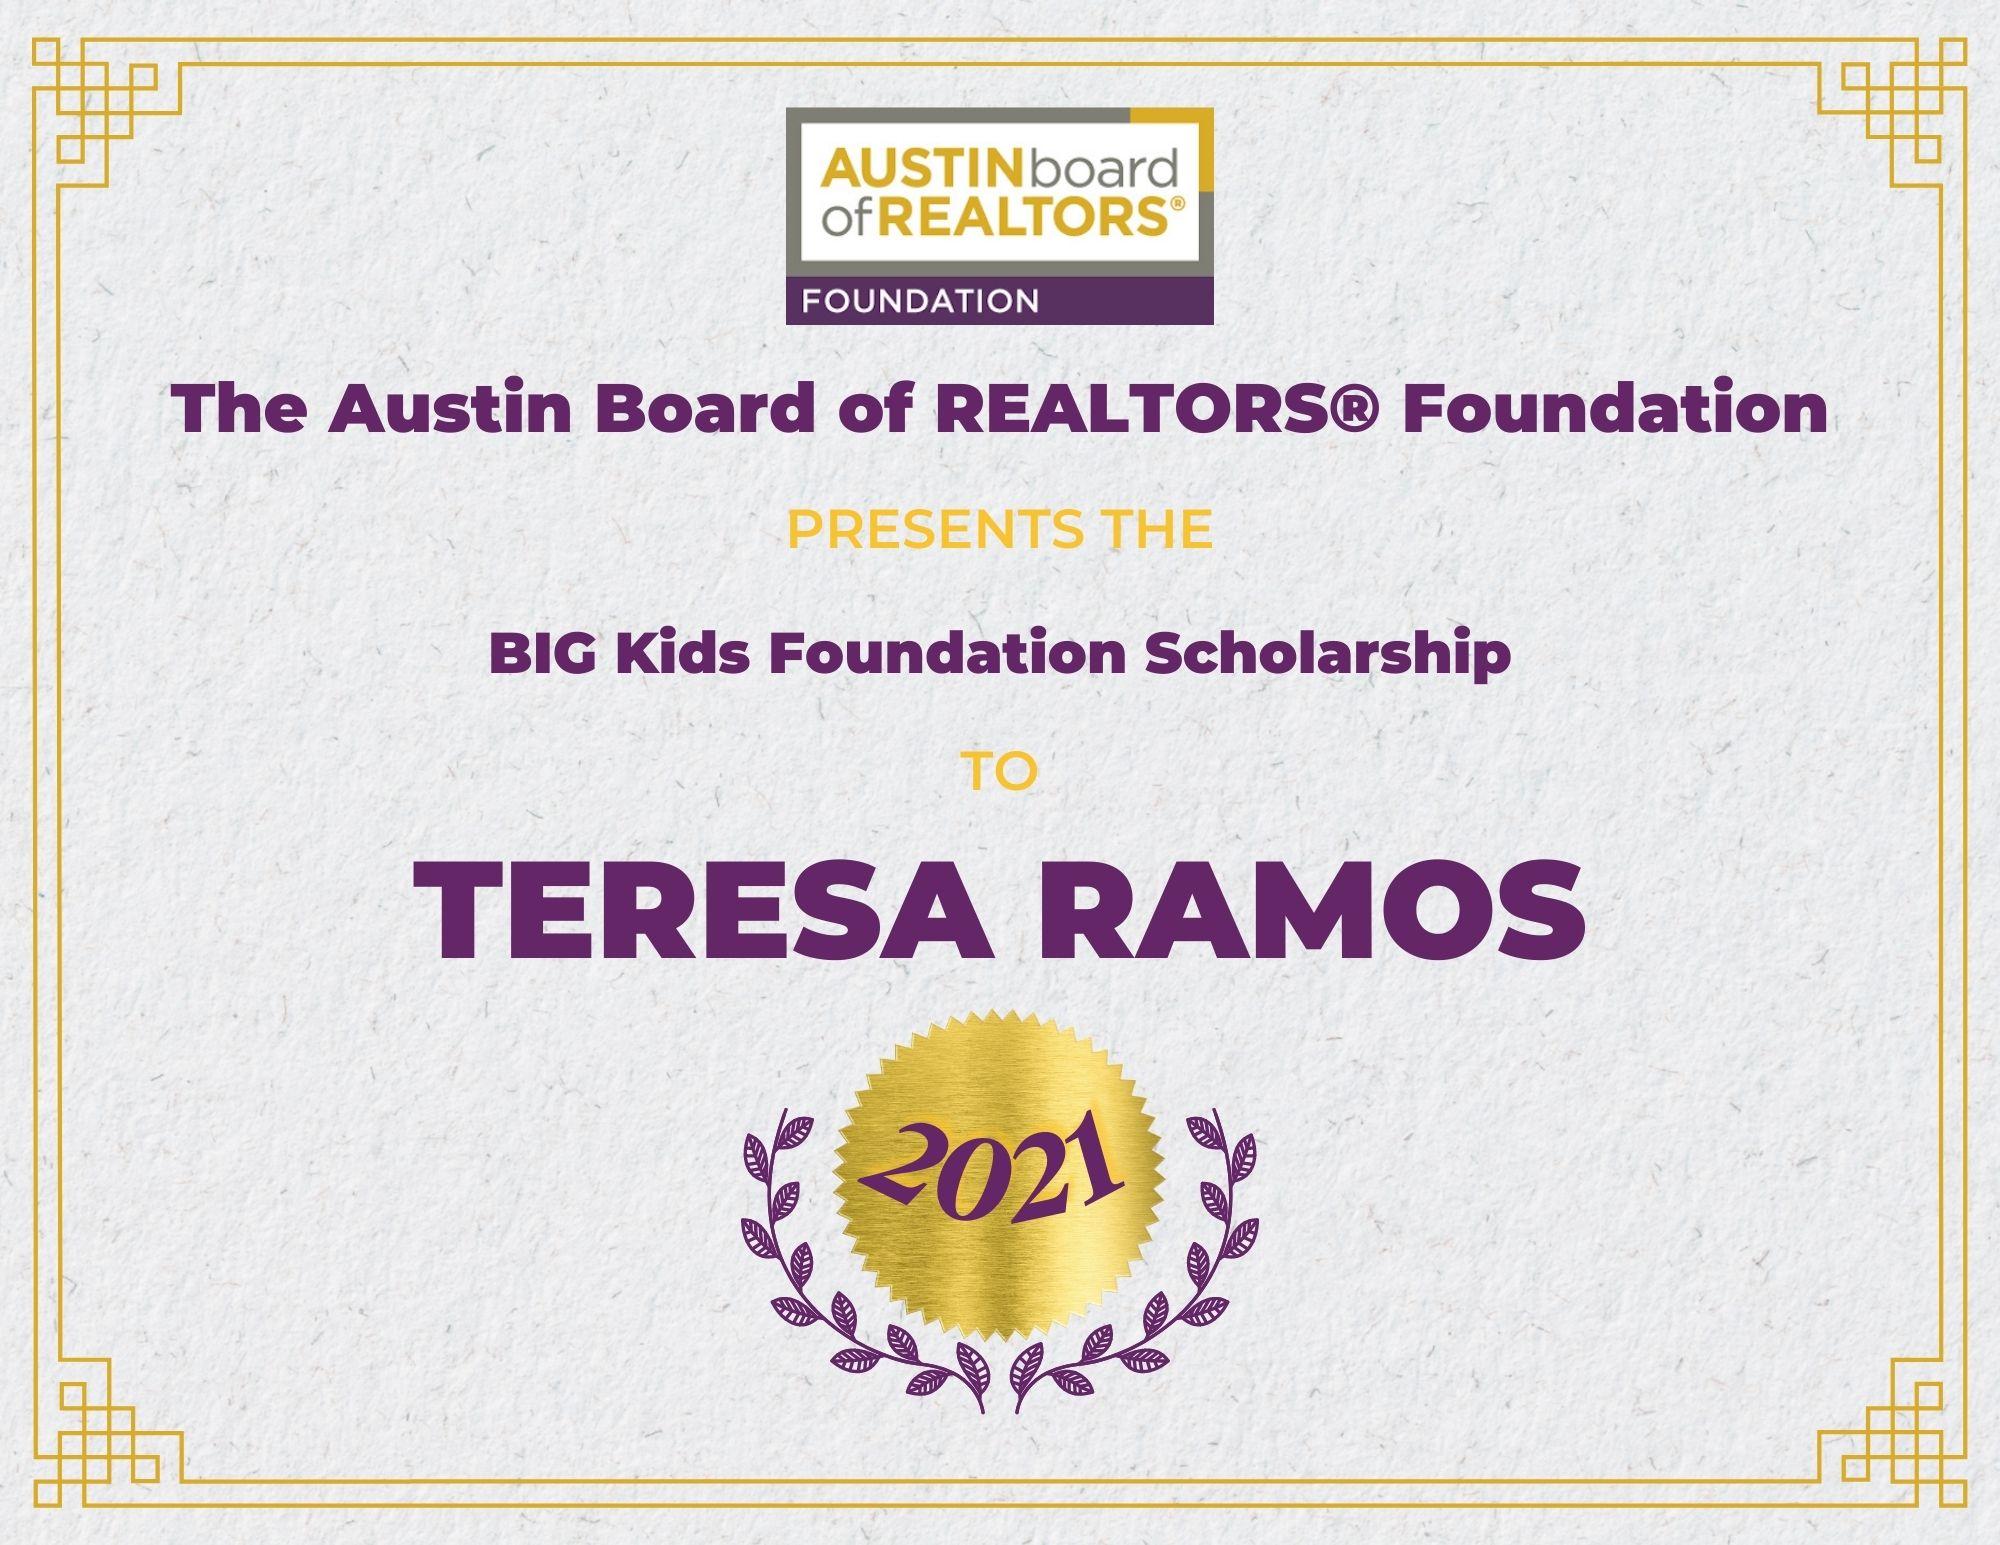 2021 Fou Scholarship Certificate_Teresaramos